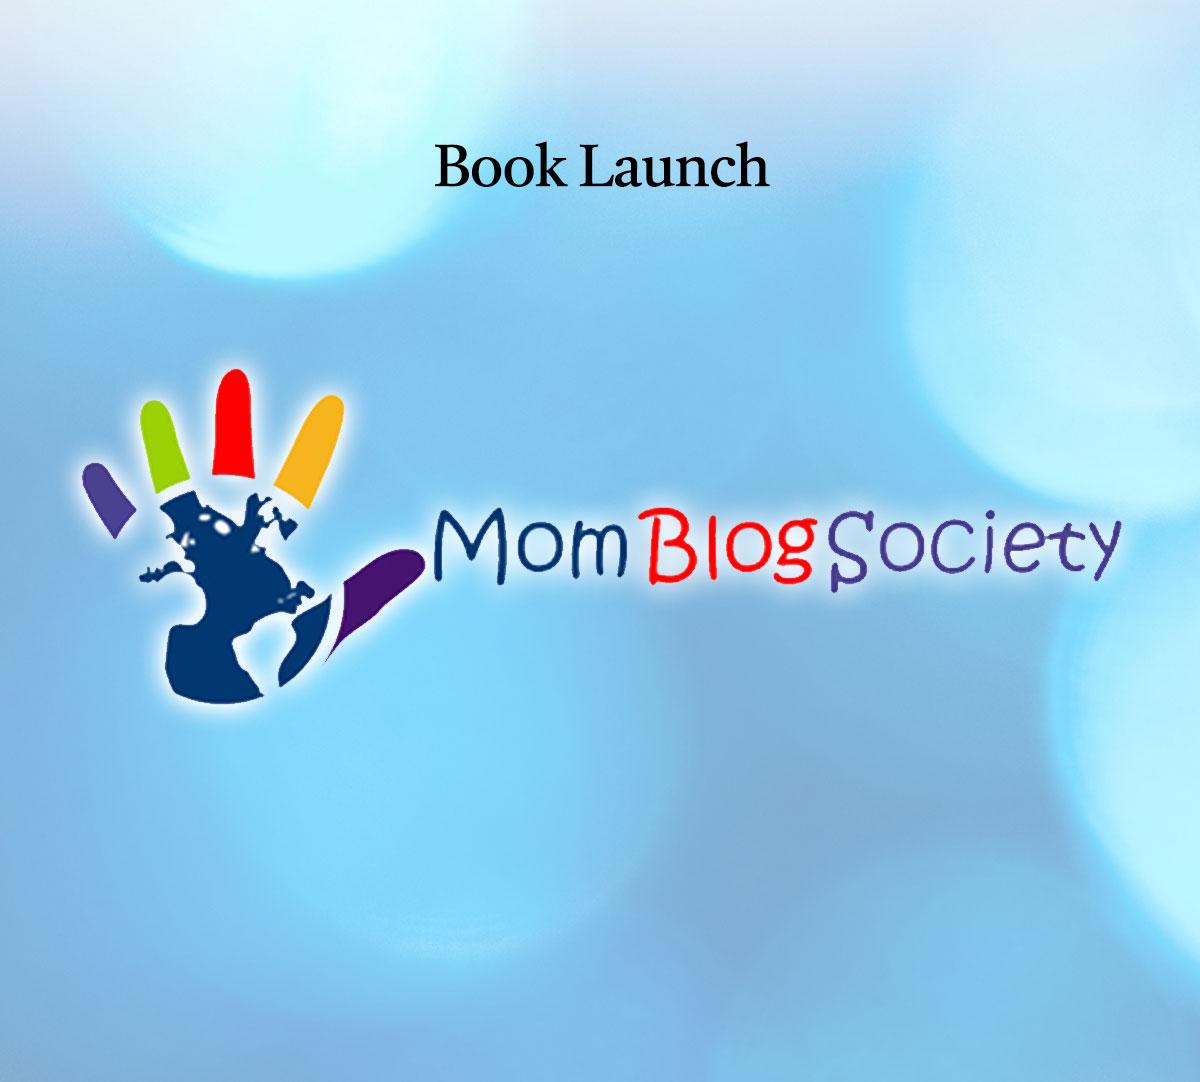 Mom Blog Society • News